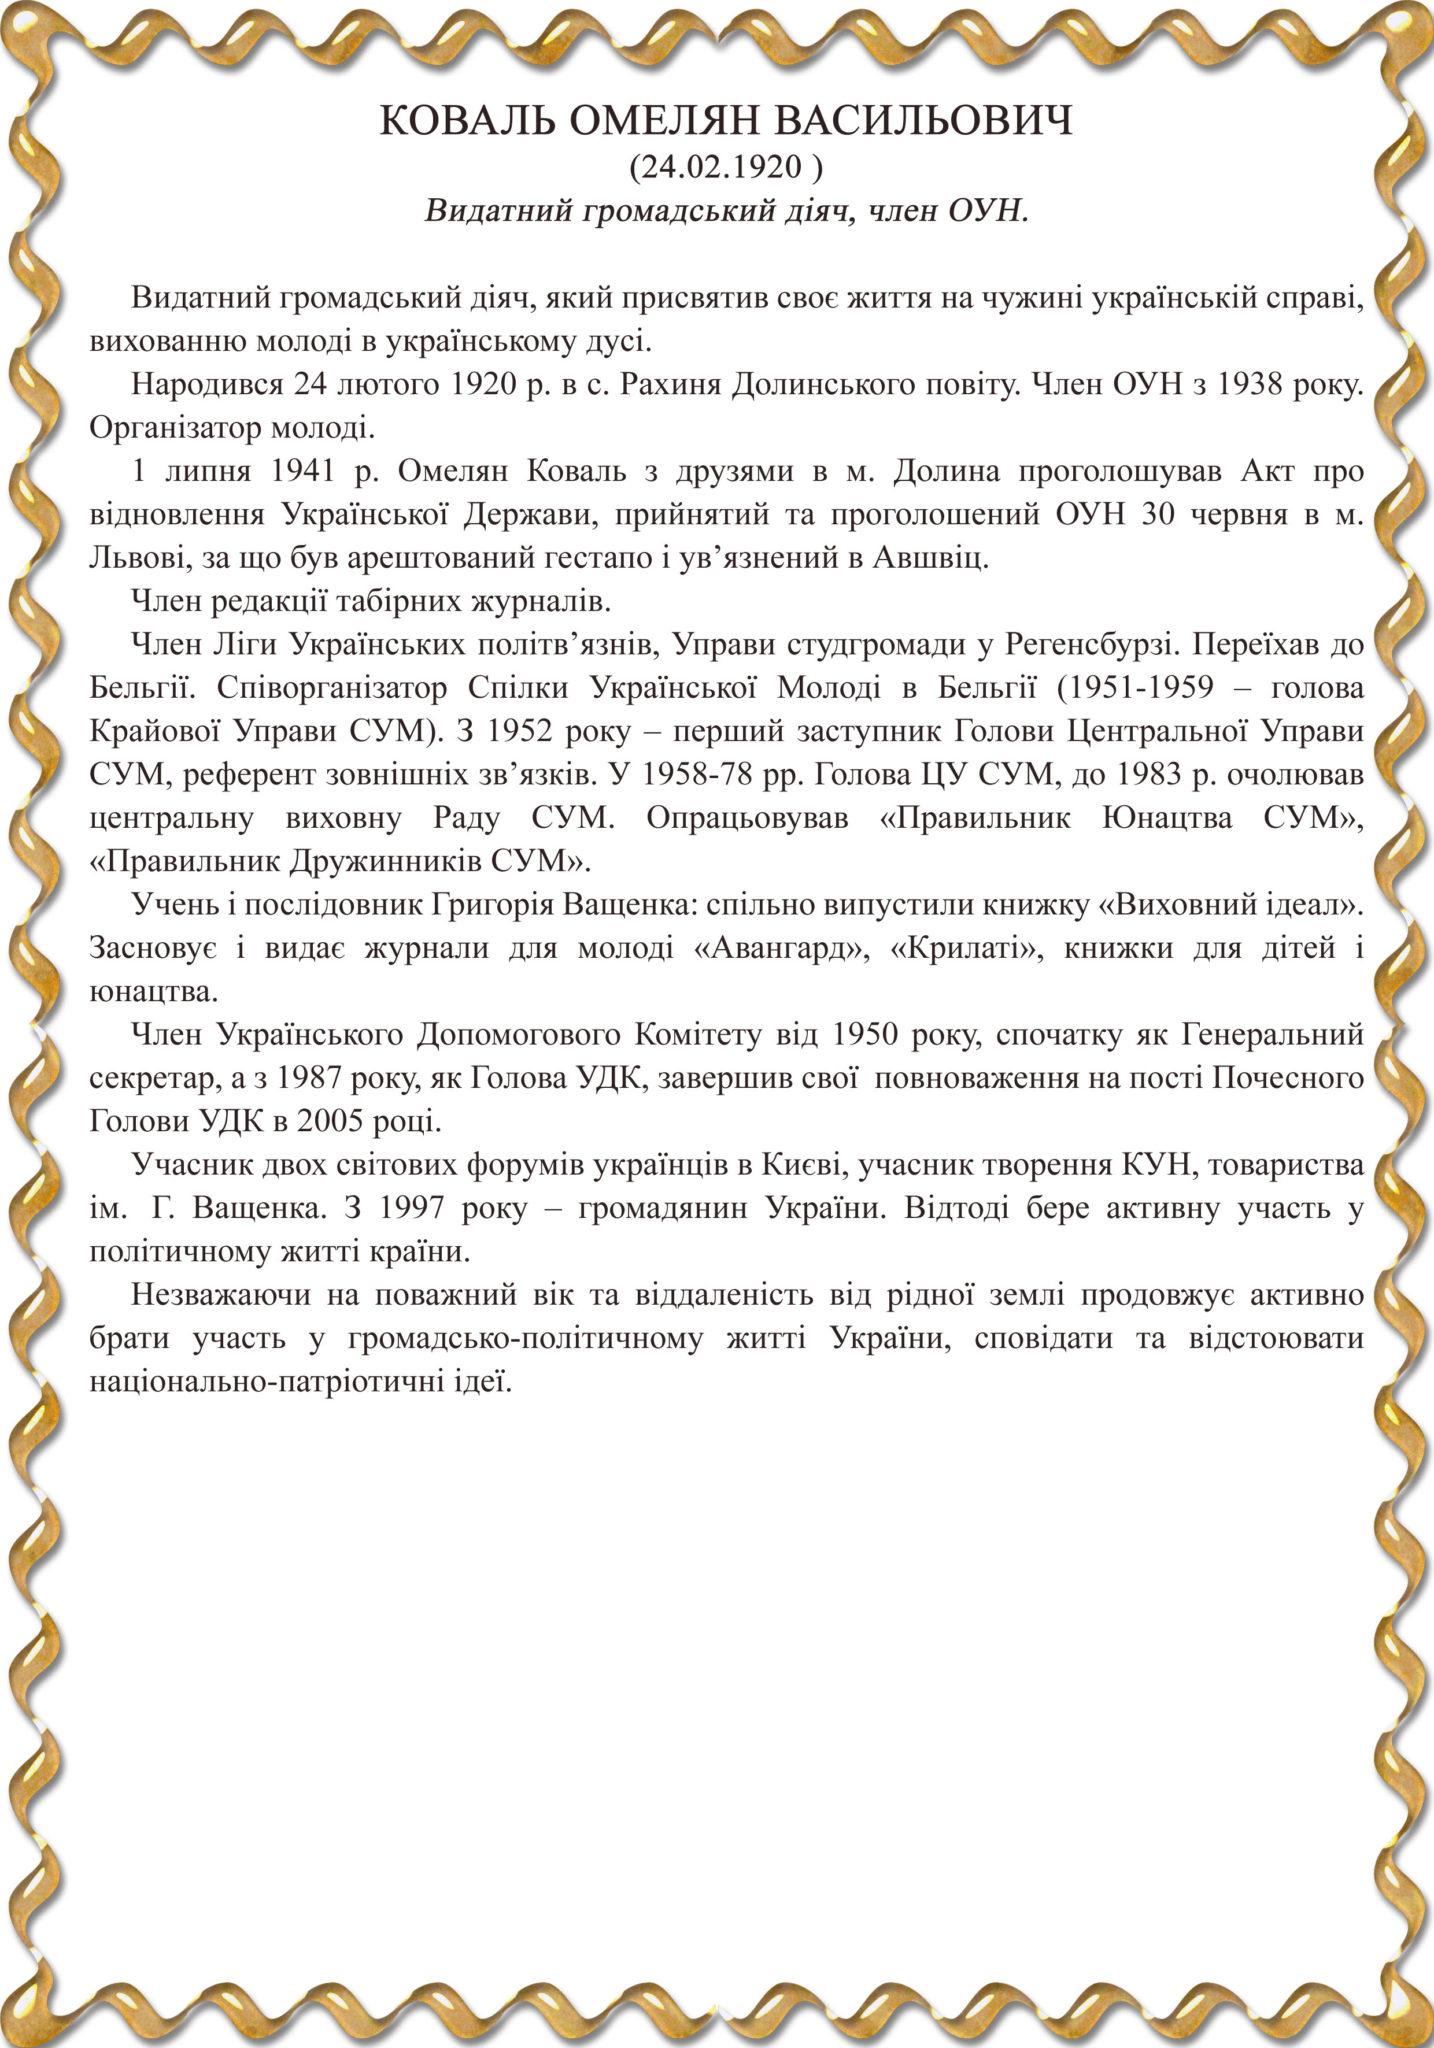 http://opendata.dolyna.if.ua/wp-content/uploads/2018/04/2-20.jpg